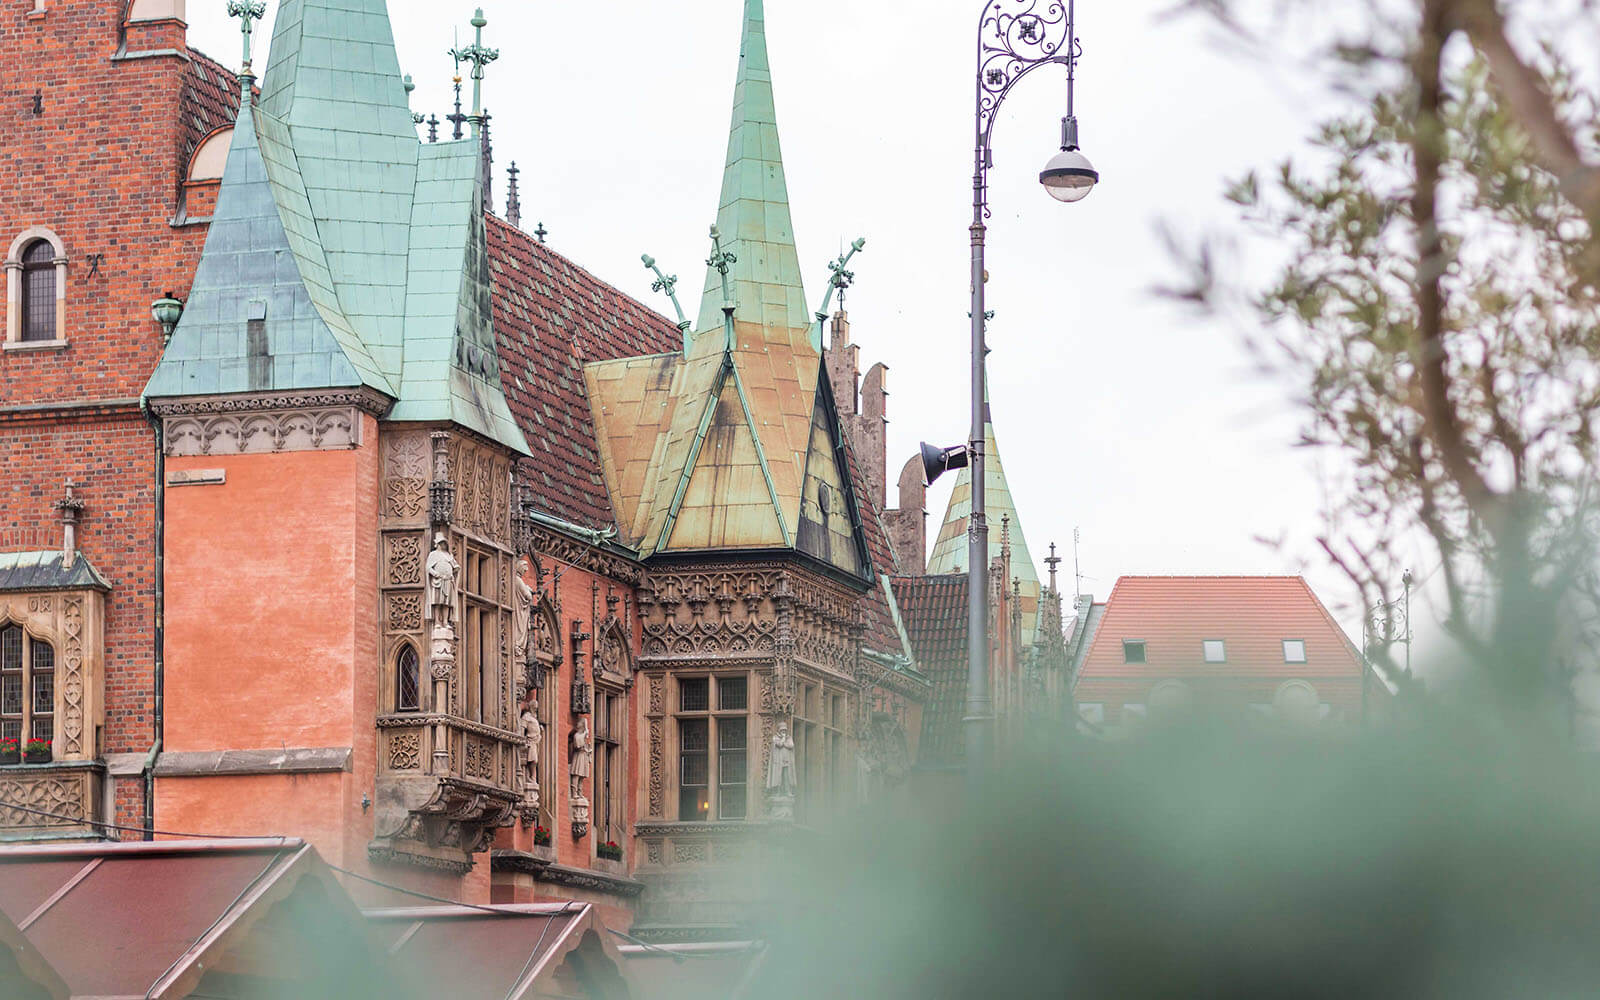 Ratusz weWrocławiu